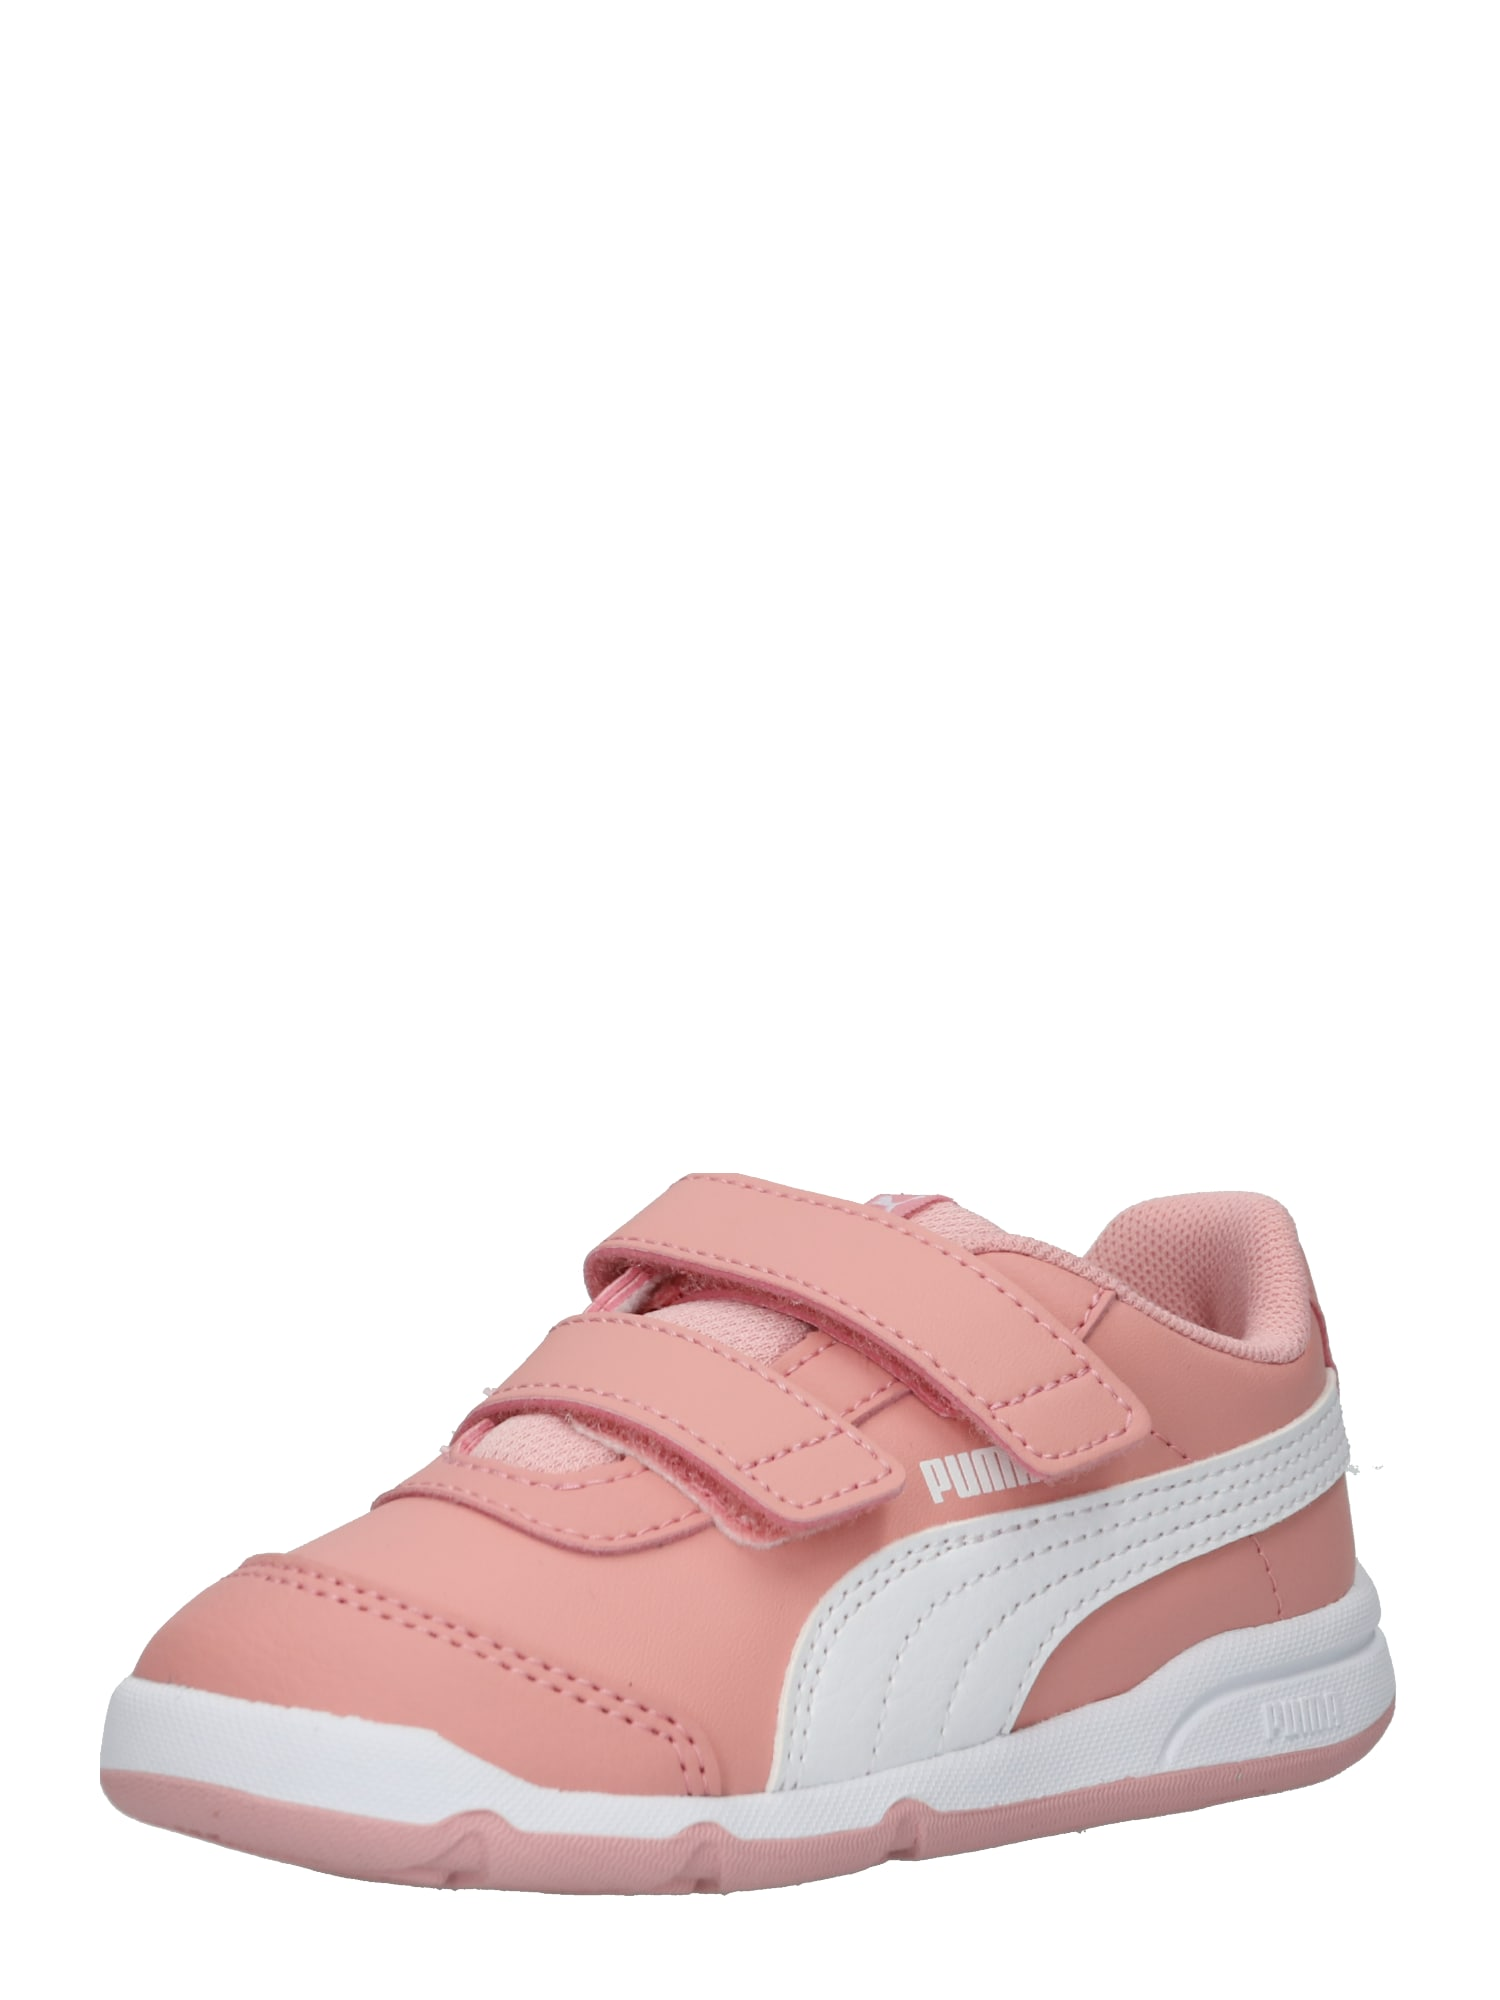 Sportovní boty Stepfleex 2 SL VE V Inf růžová PUMA